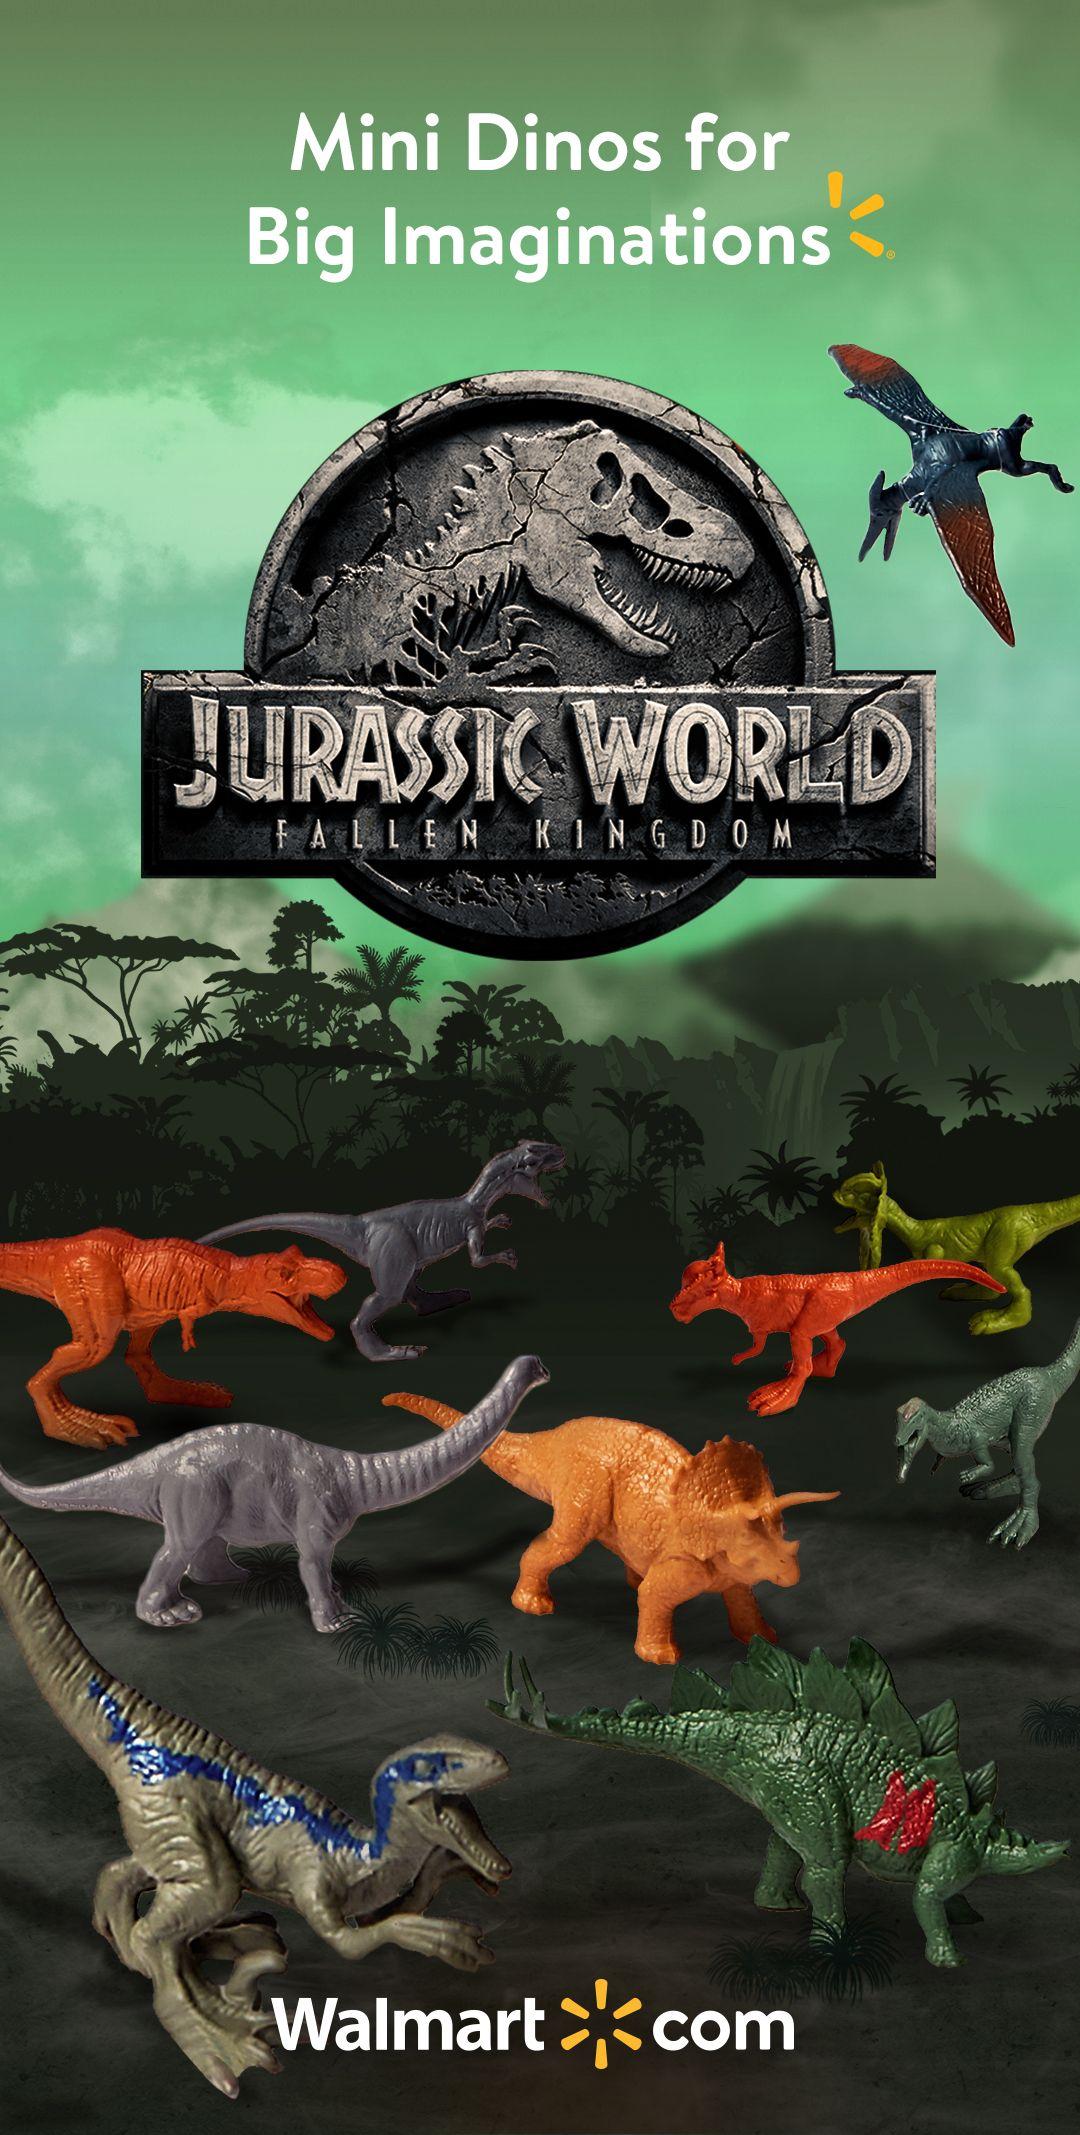 Toys Jurassic world, Falling kingdoms, Jurassic world